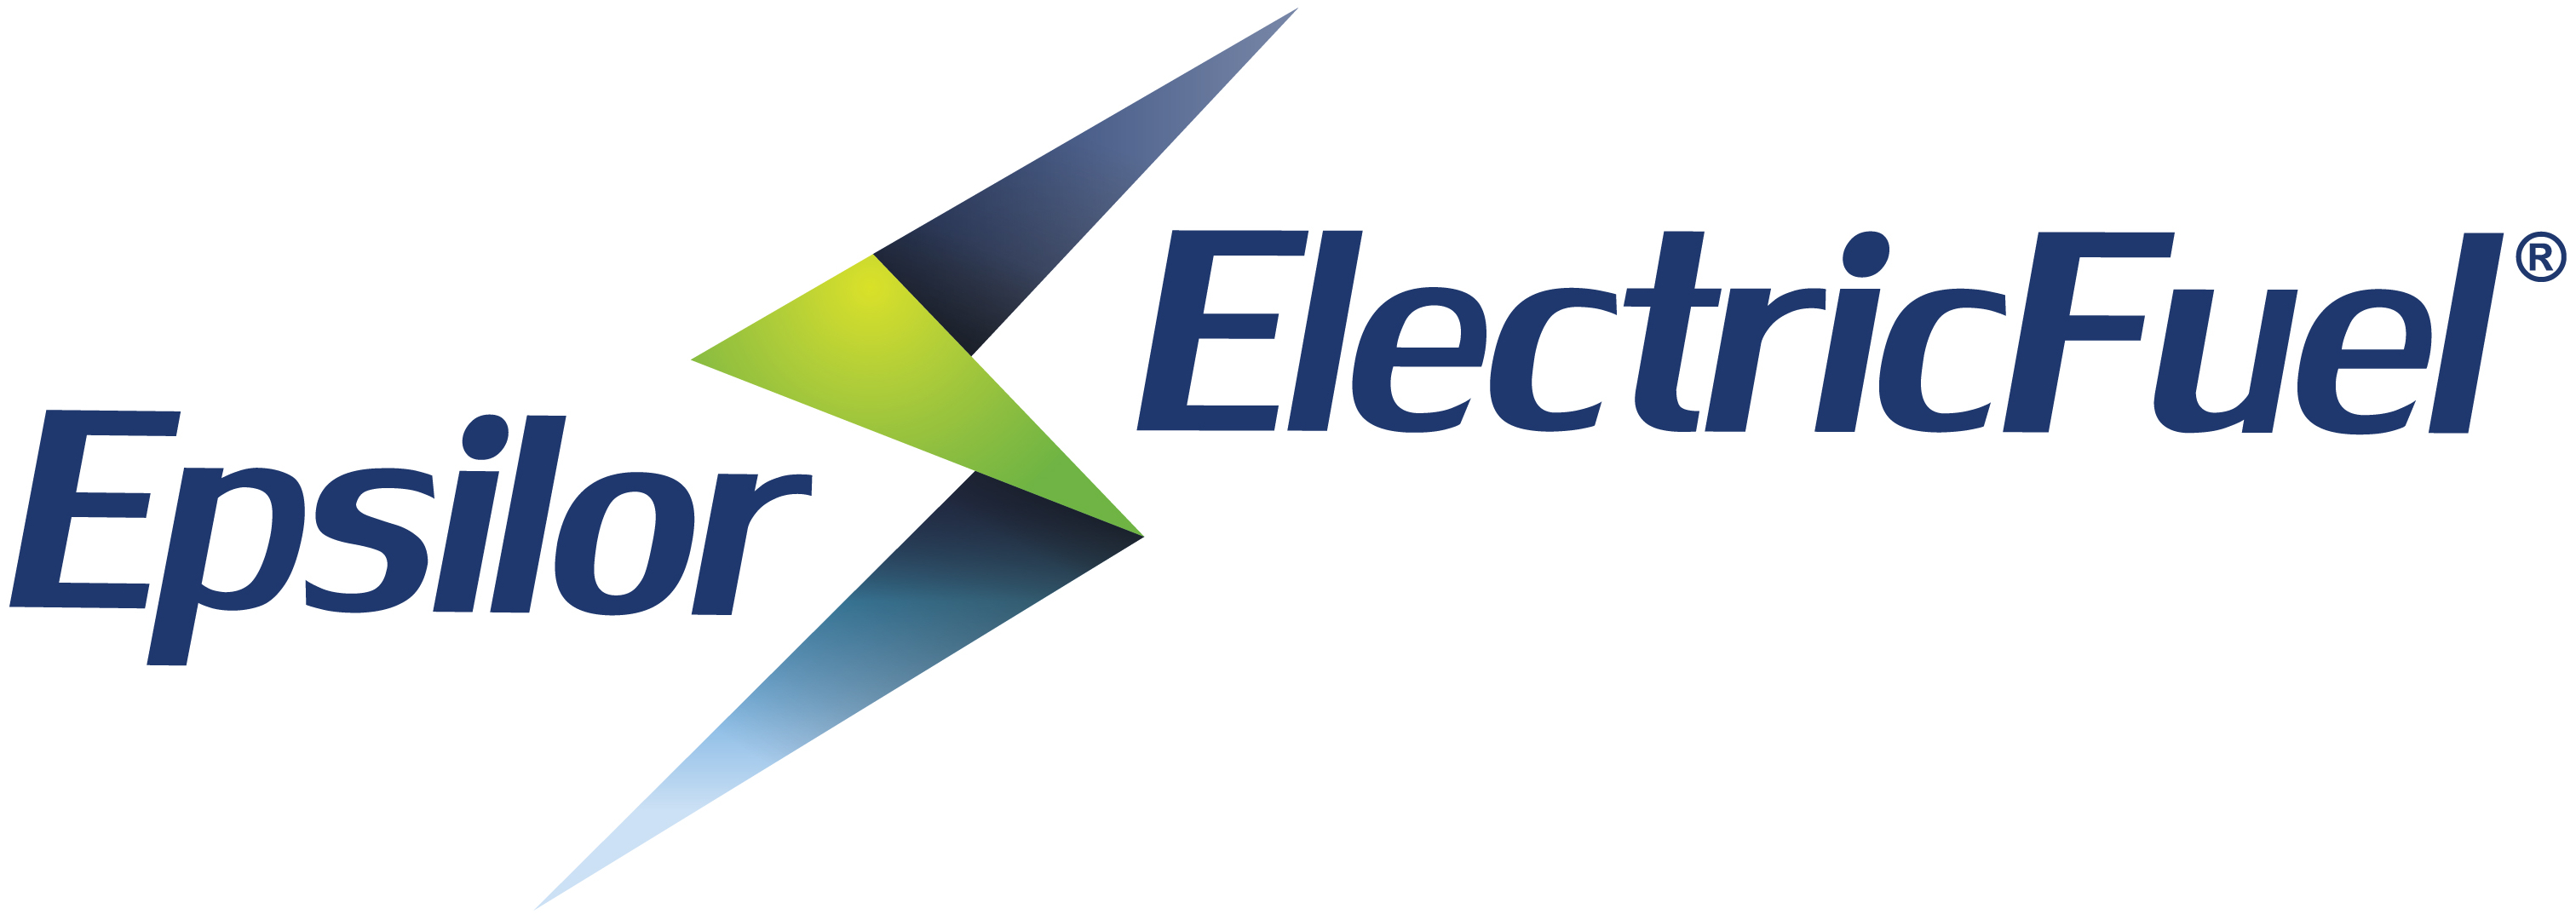 Epsilor-ElecticFuel Logo